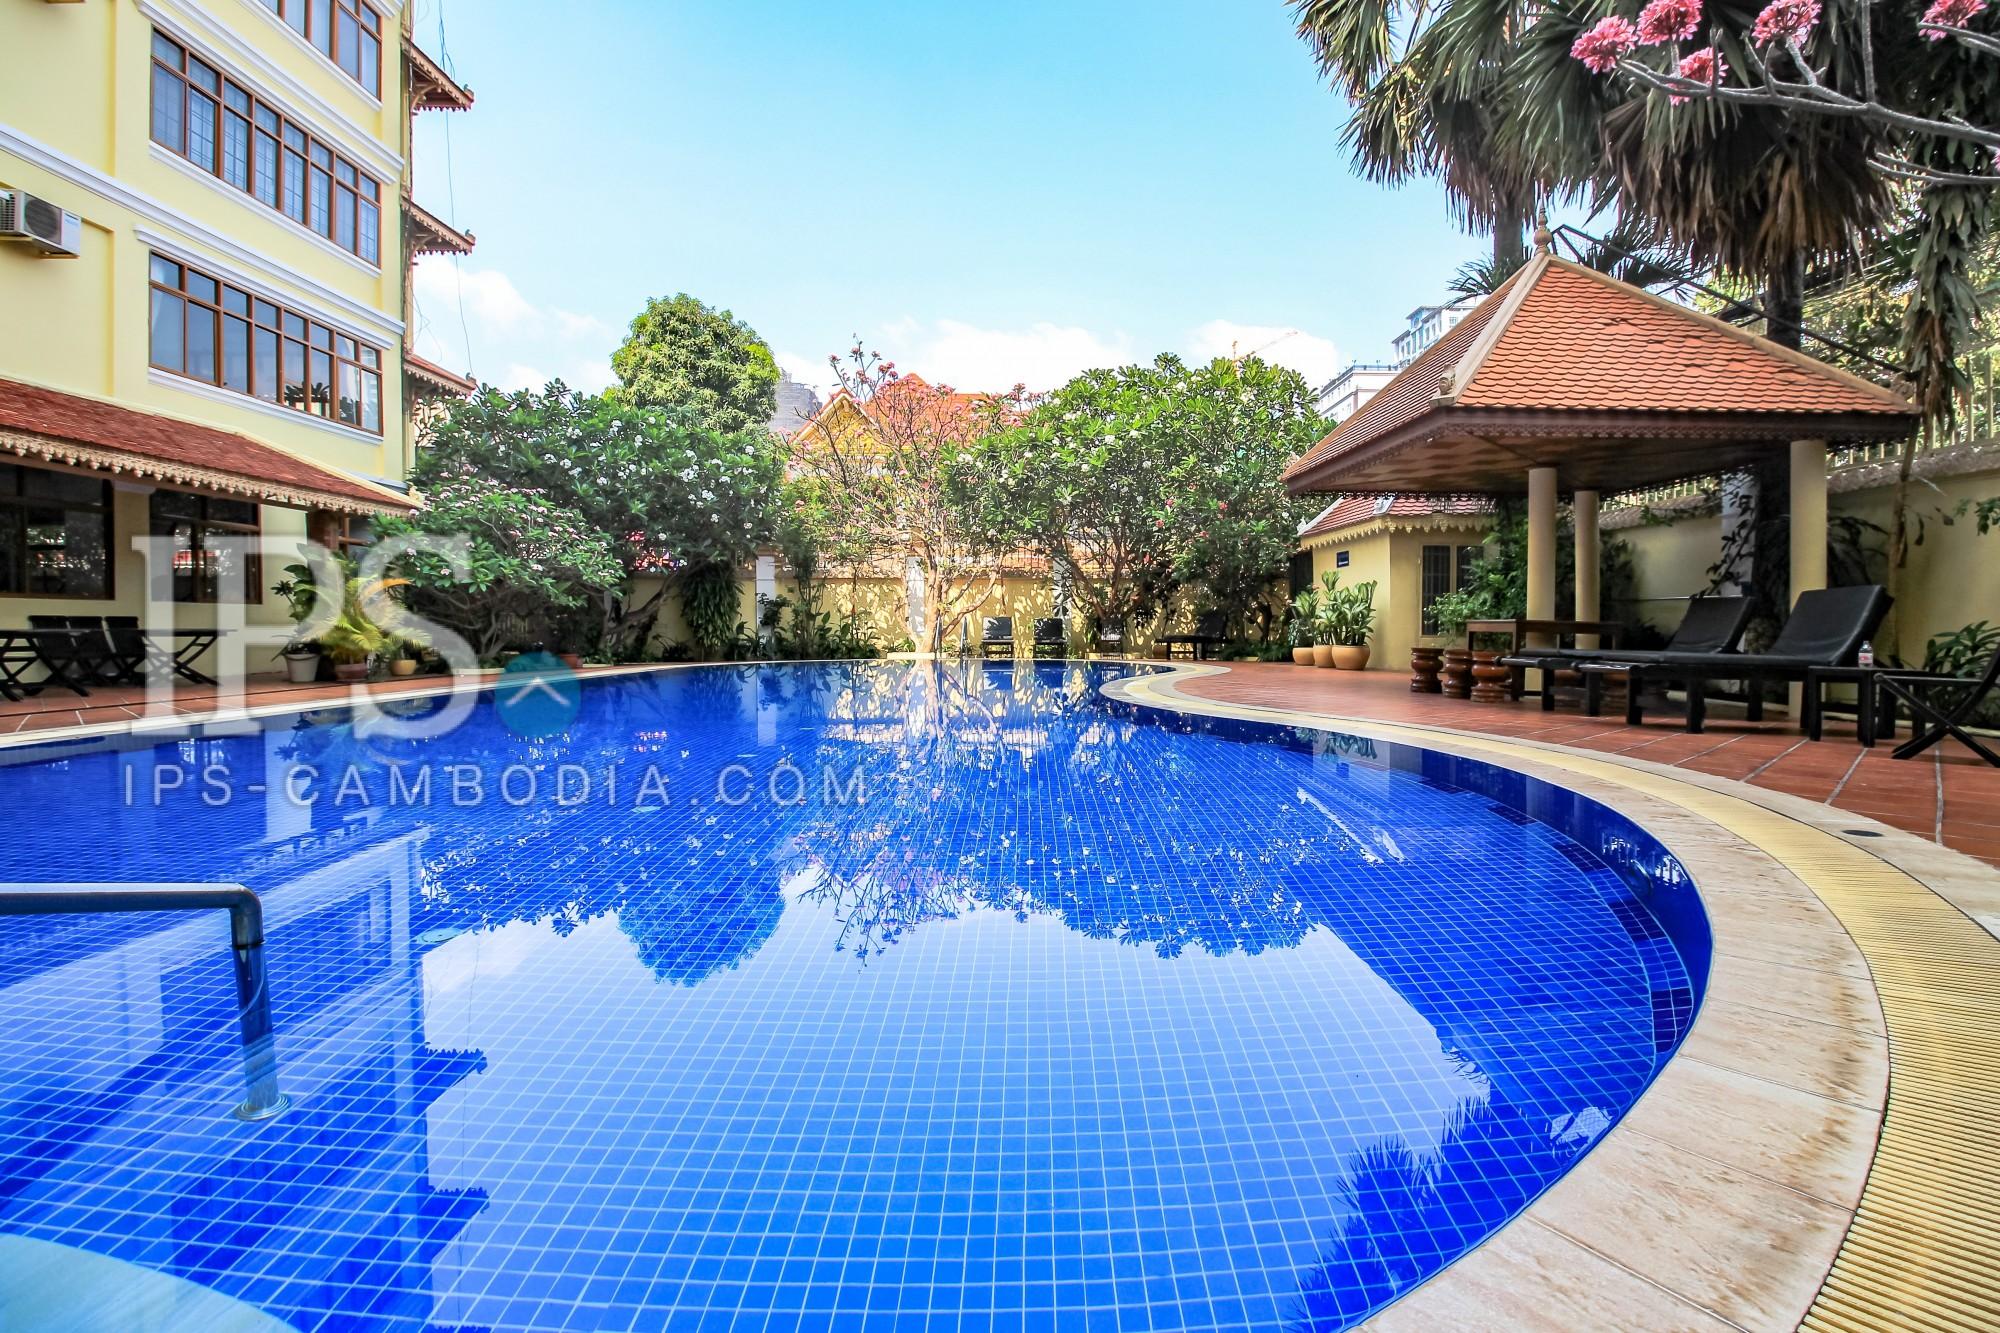 2 Bedroom Apartment for Rent - Central BKK1